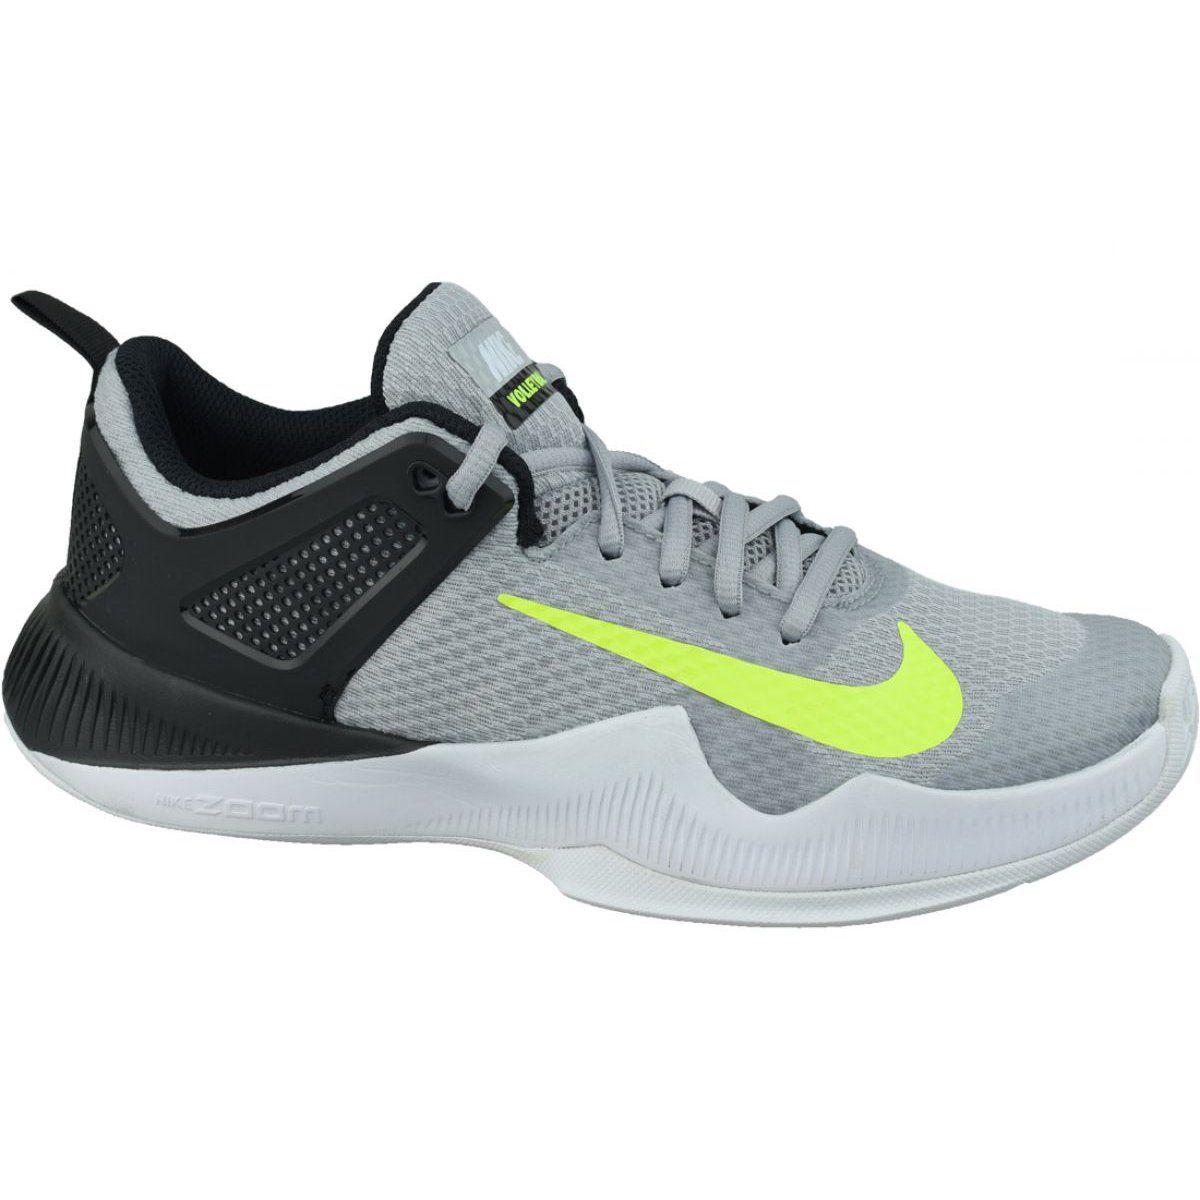 Buty Nike Air Zoom Hyperace M 902367 007 Szare Nike Women Nike Air Nike Air Zoom